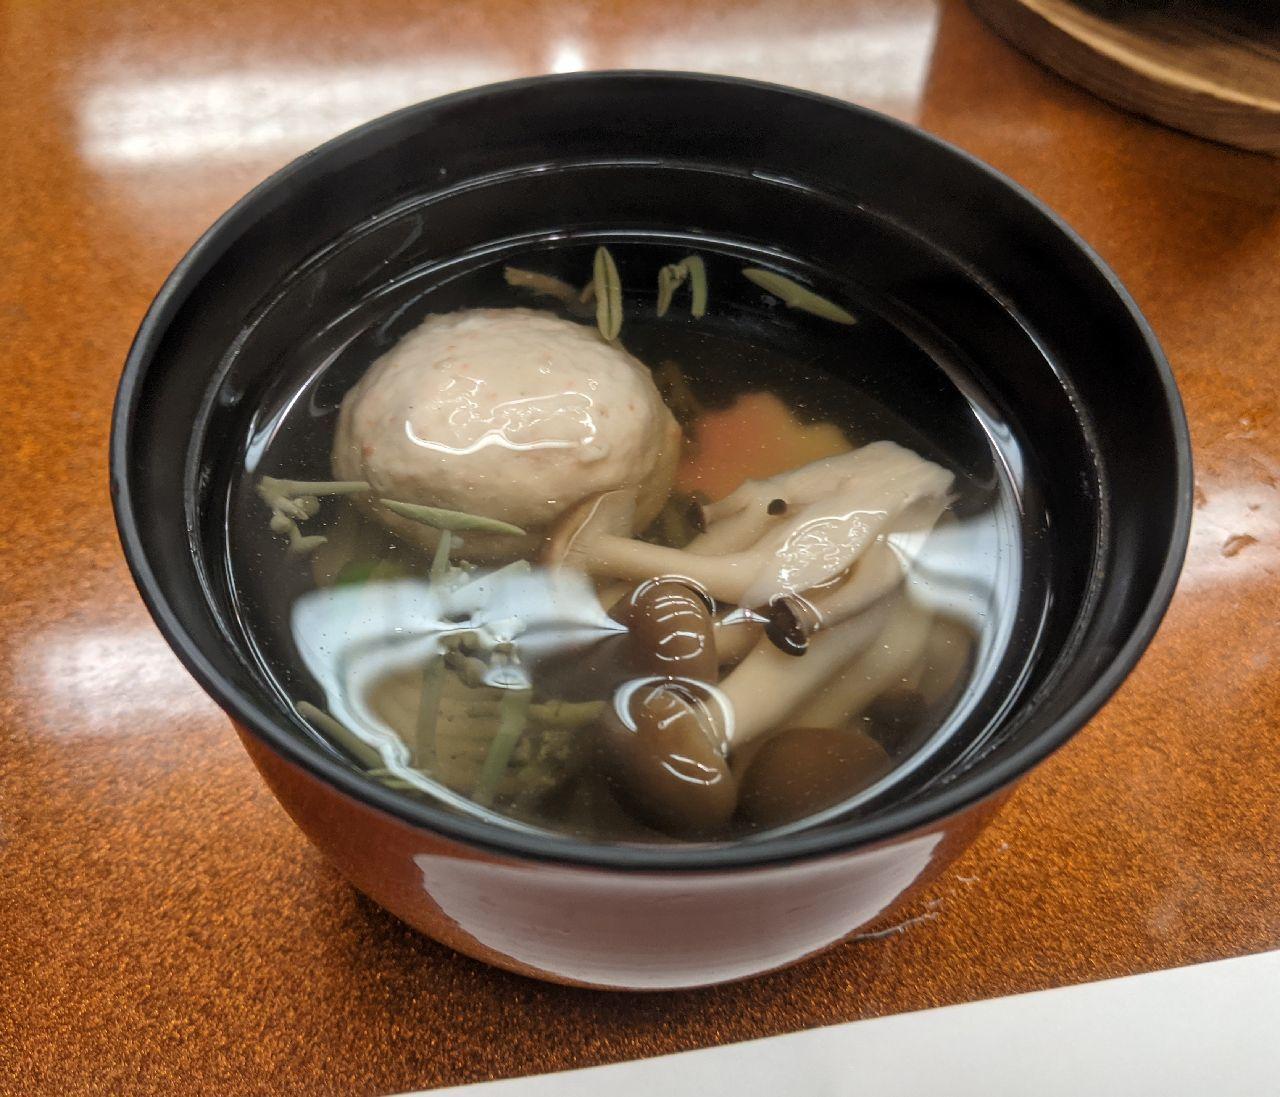 PXL_20210703_101816324清汁仕立椀 蟹真蒸 三つ葉 柚子 梅素麺